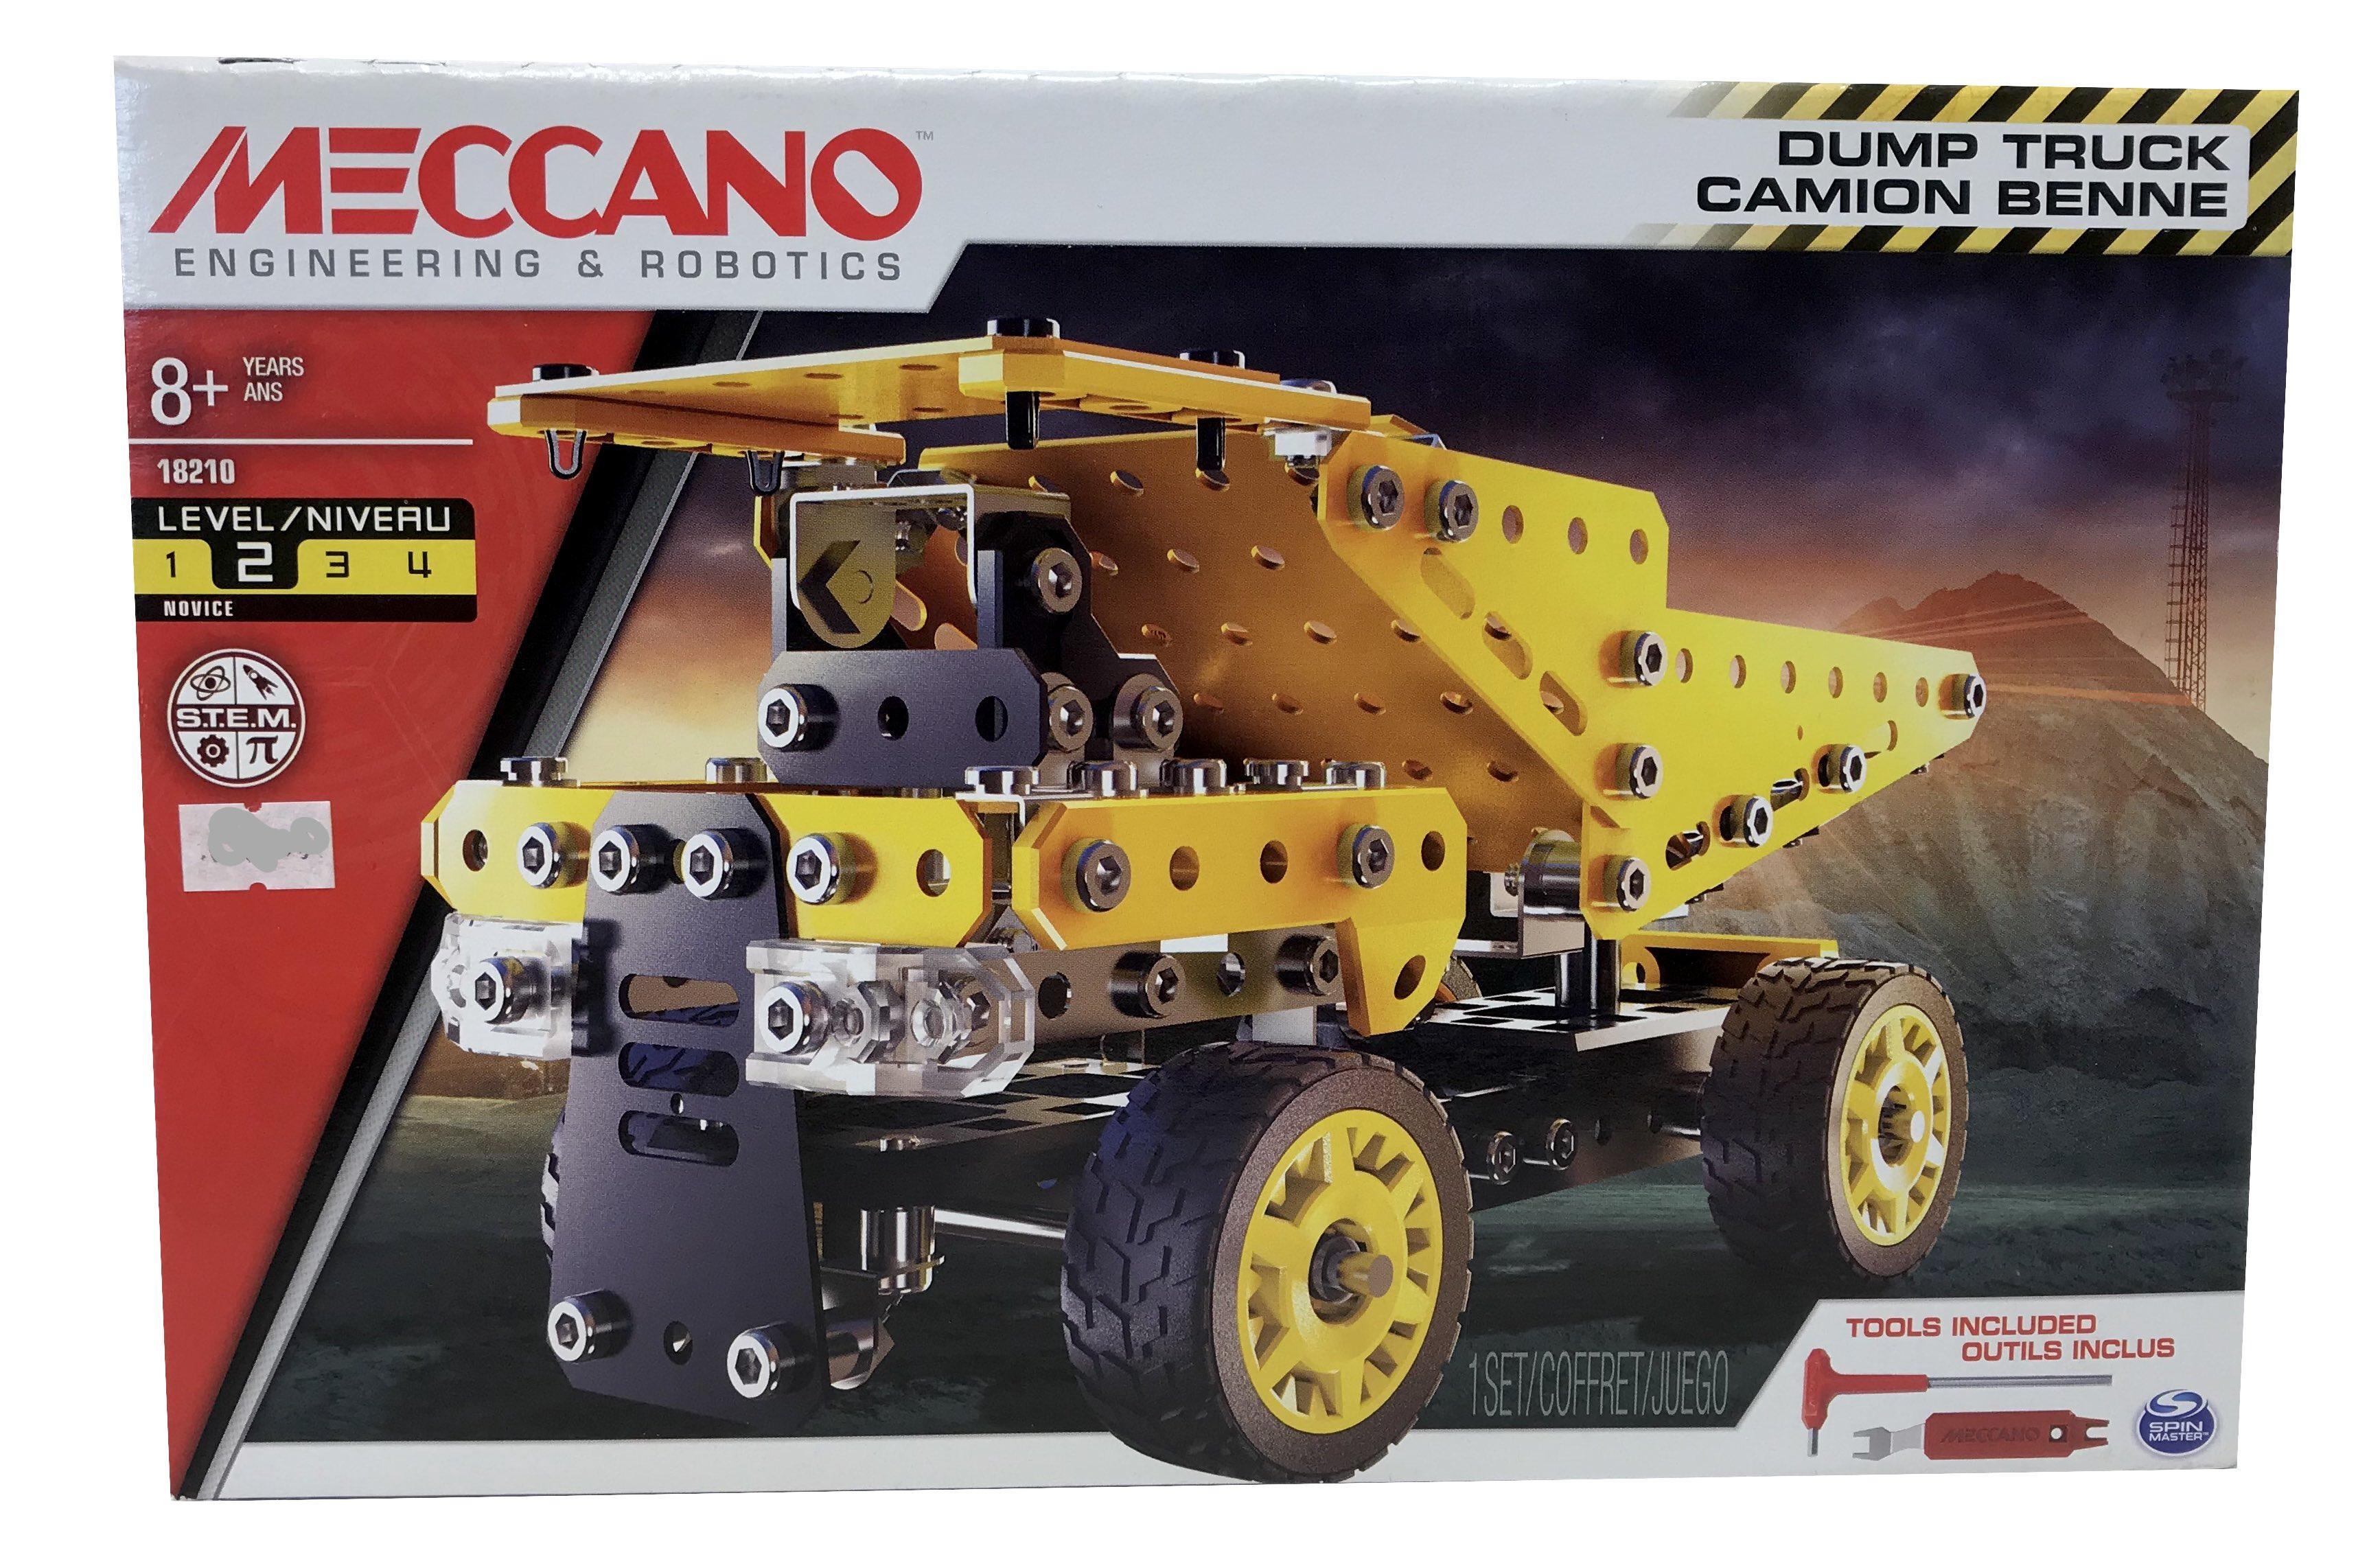 Meccano Dump Truck Camion Benne